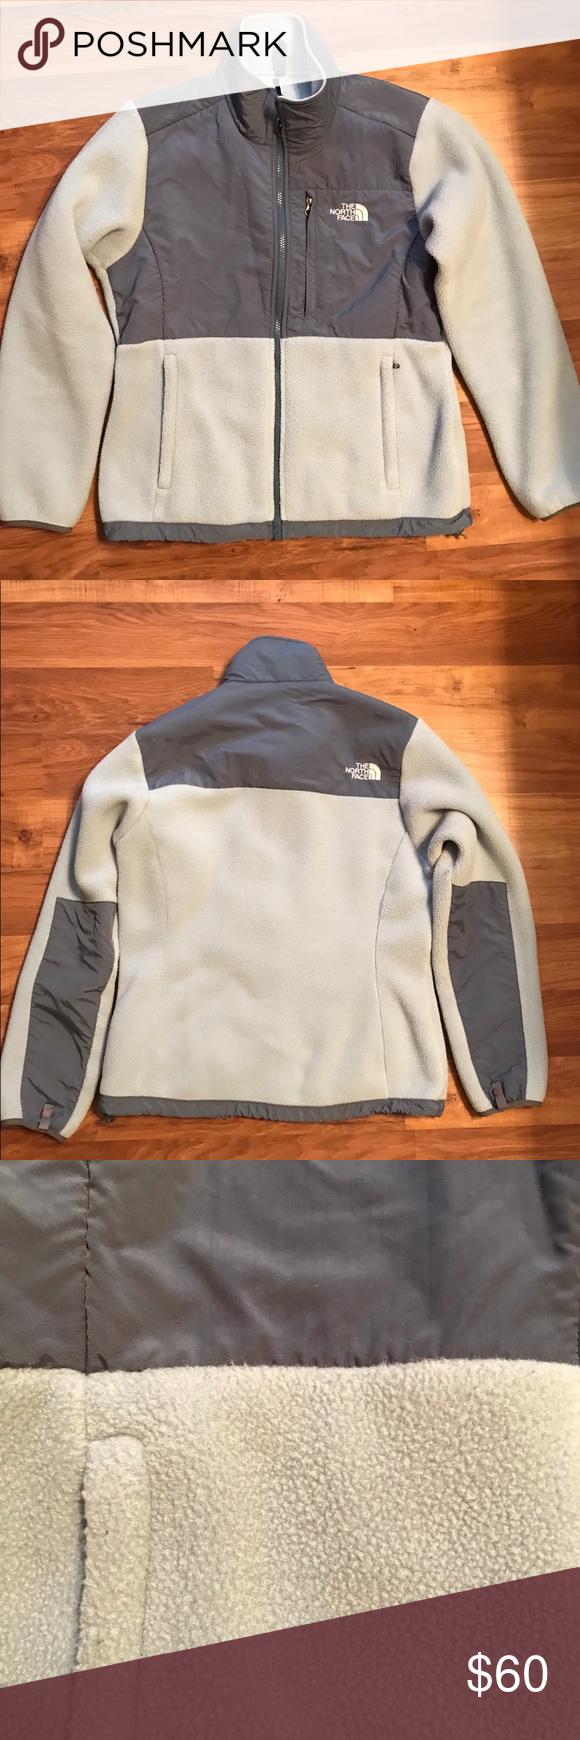 North Face Denali Jacket Clothes Design Fashion Jackets [ 1740 x 580 Pixel ]